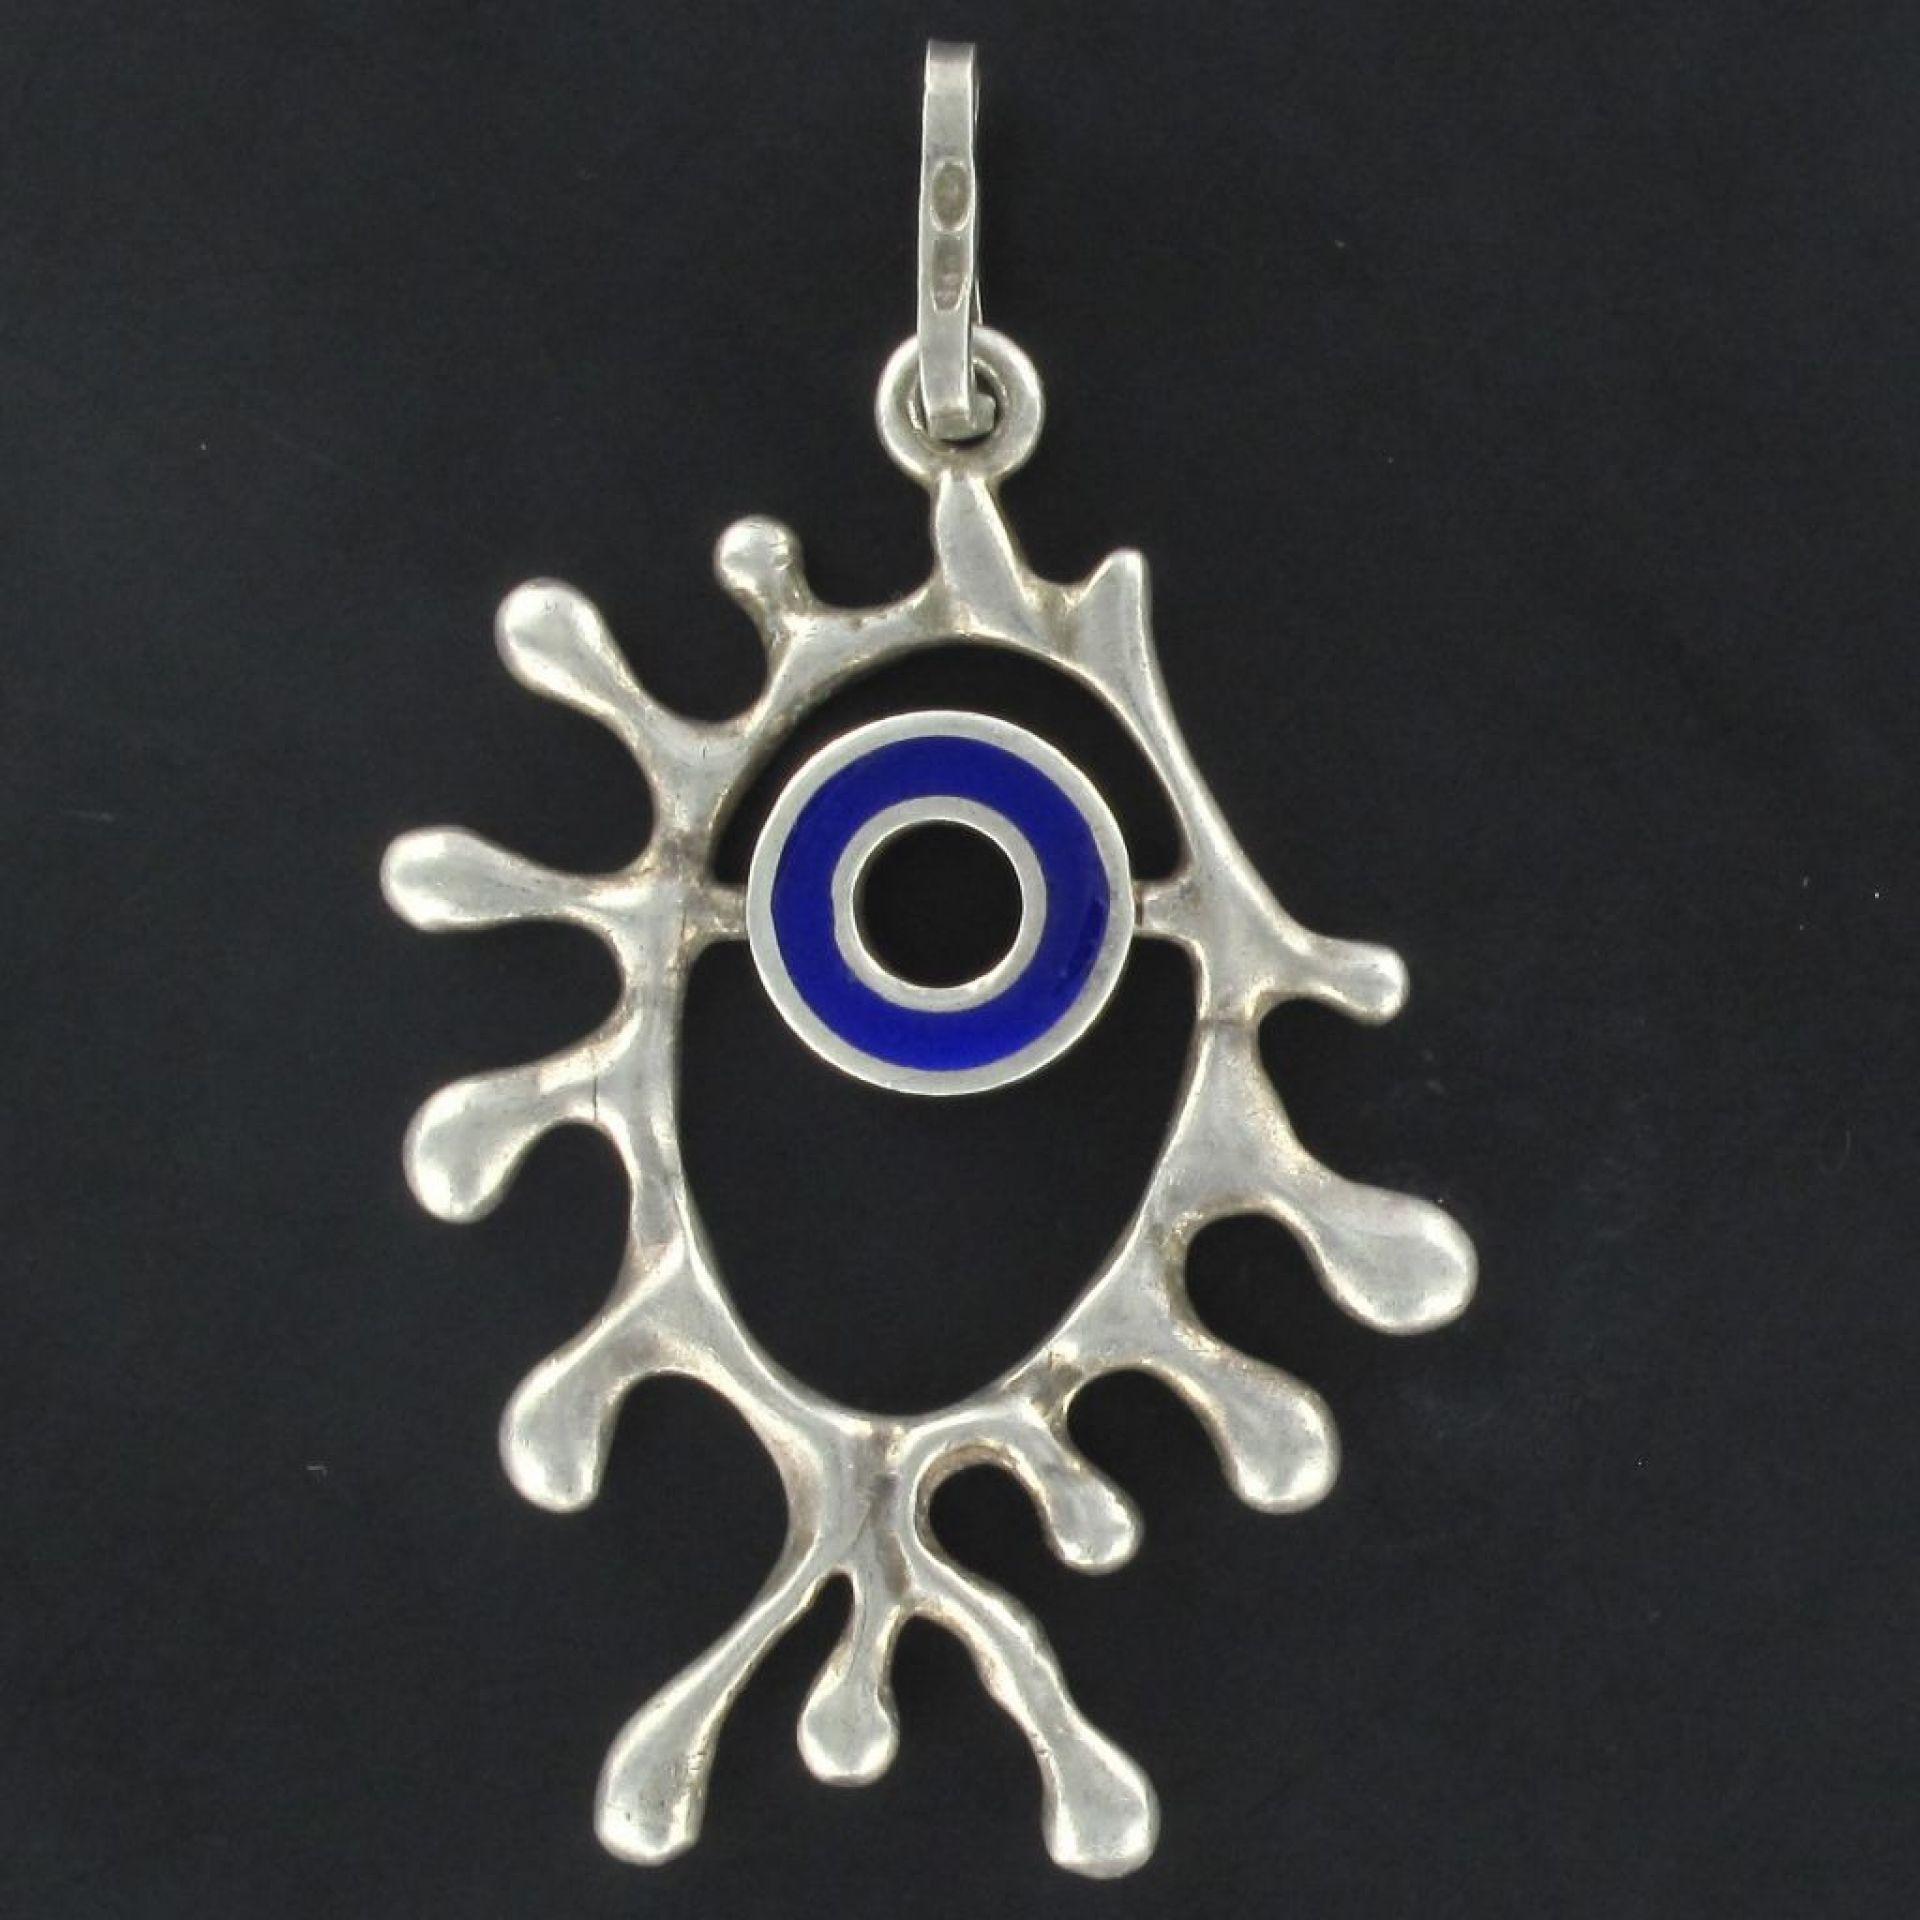 Modernist enamel silver pendant